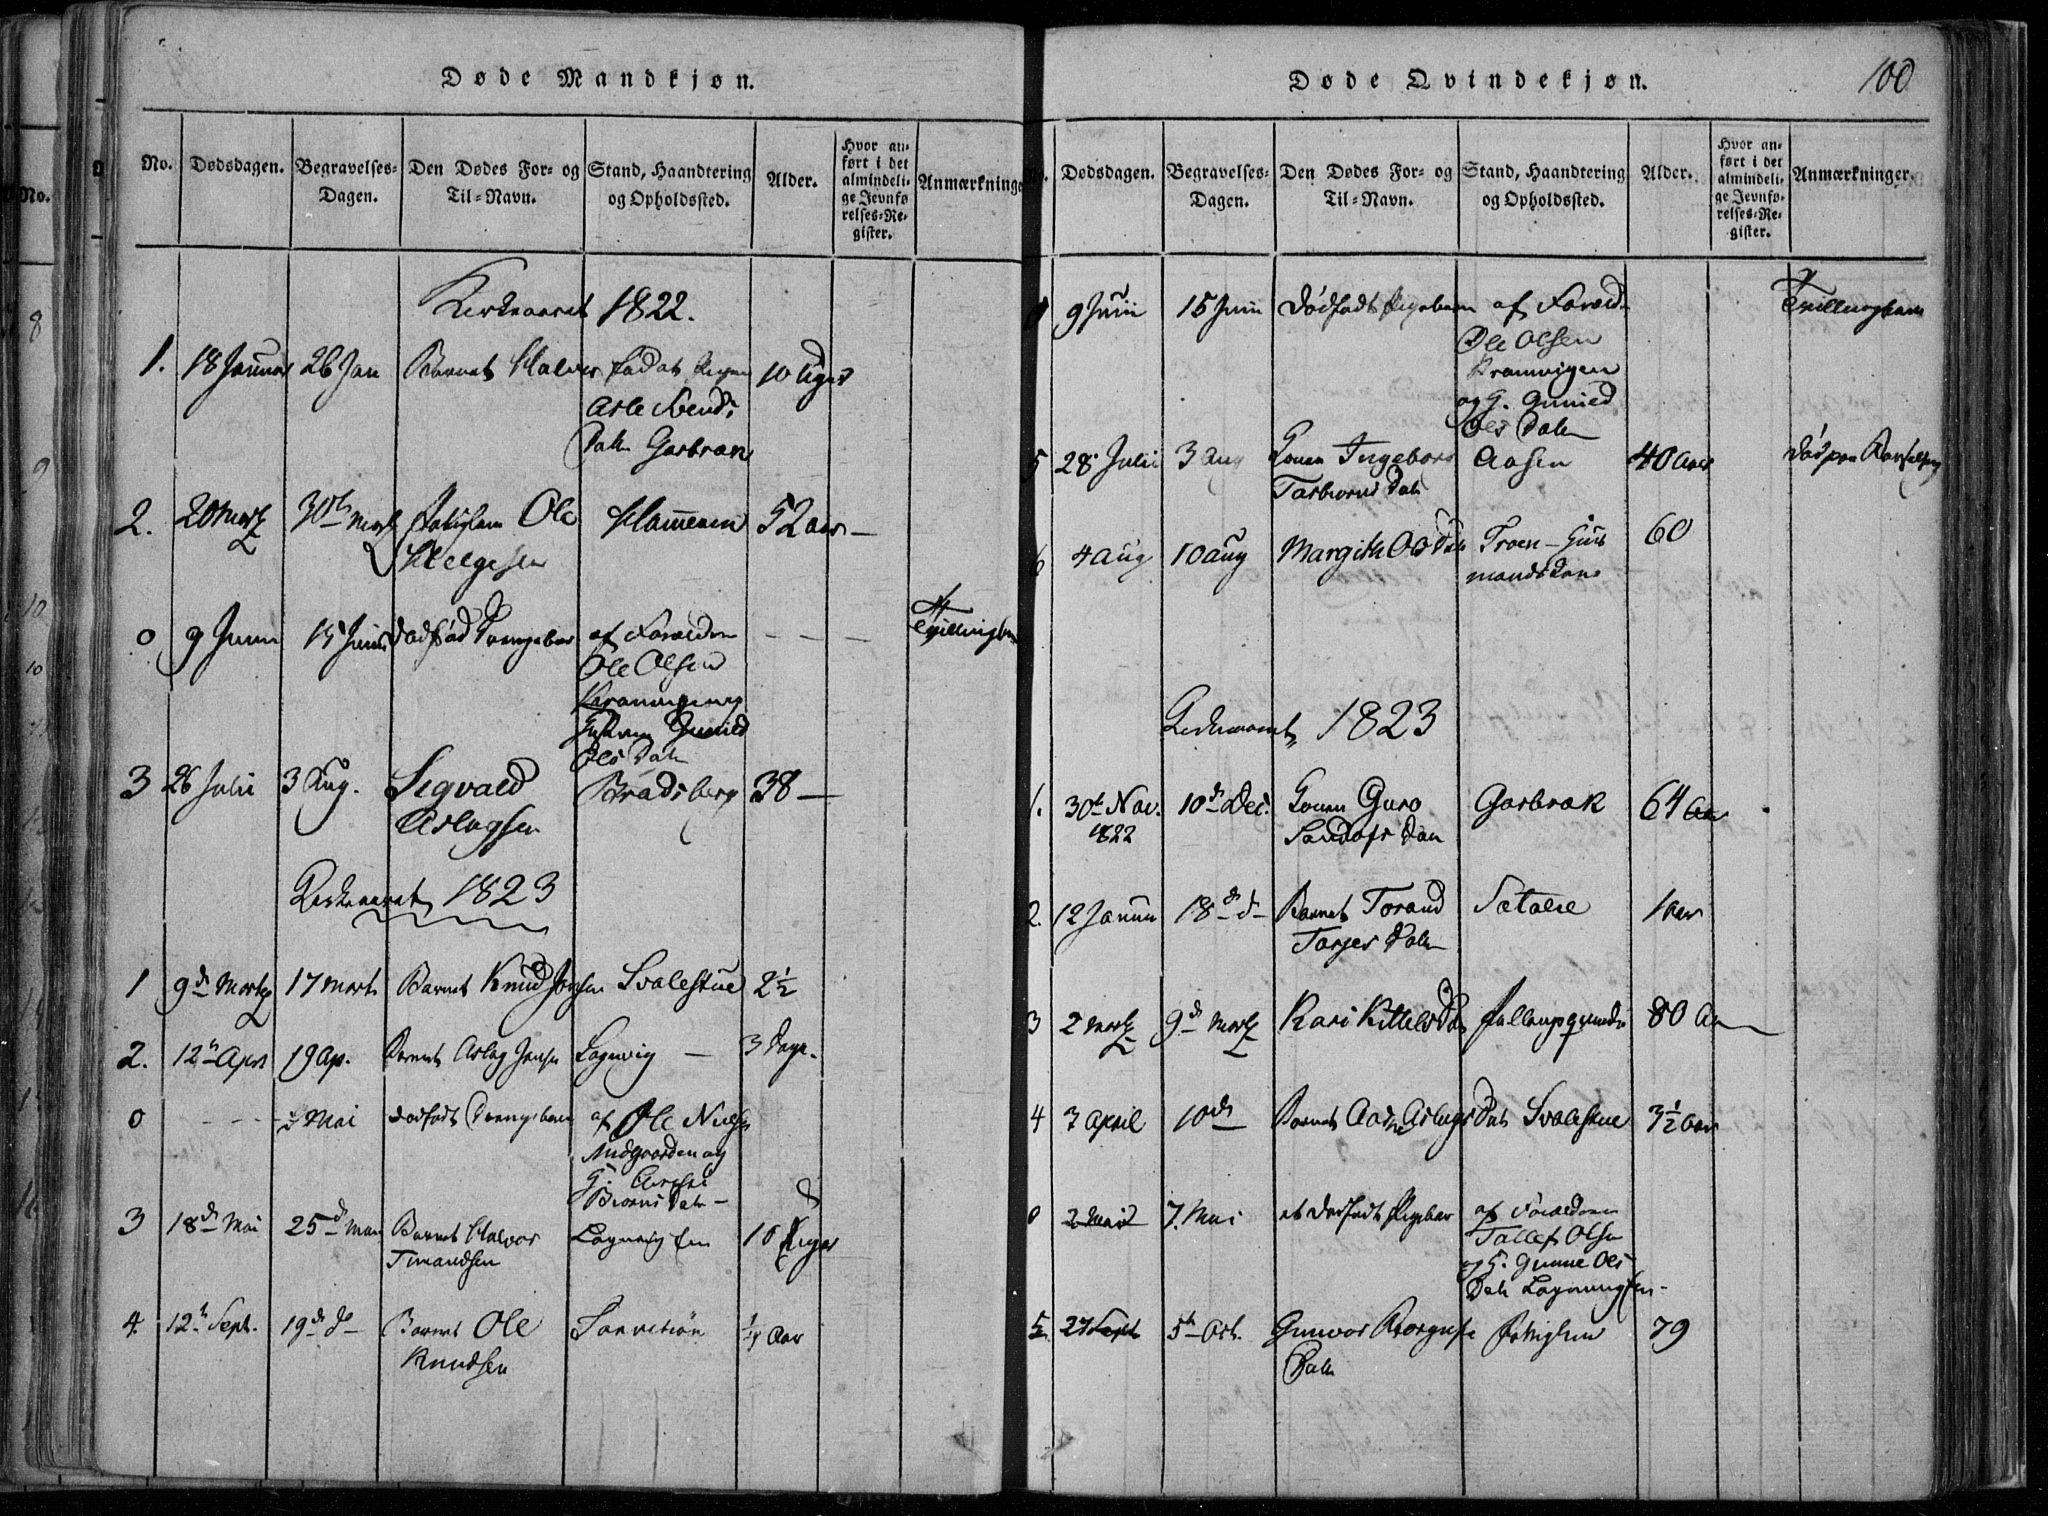 SAKO, Rauland kirkebøker, F/Fa/L0001: Ministerialbok nr. 1, 1814-1859, s. 100